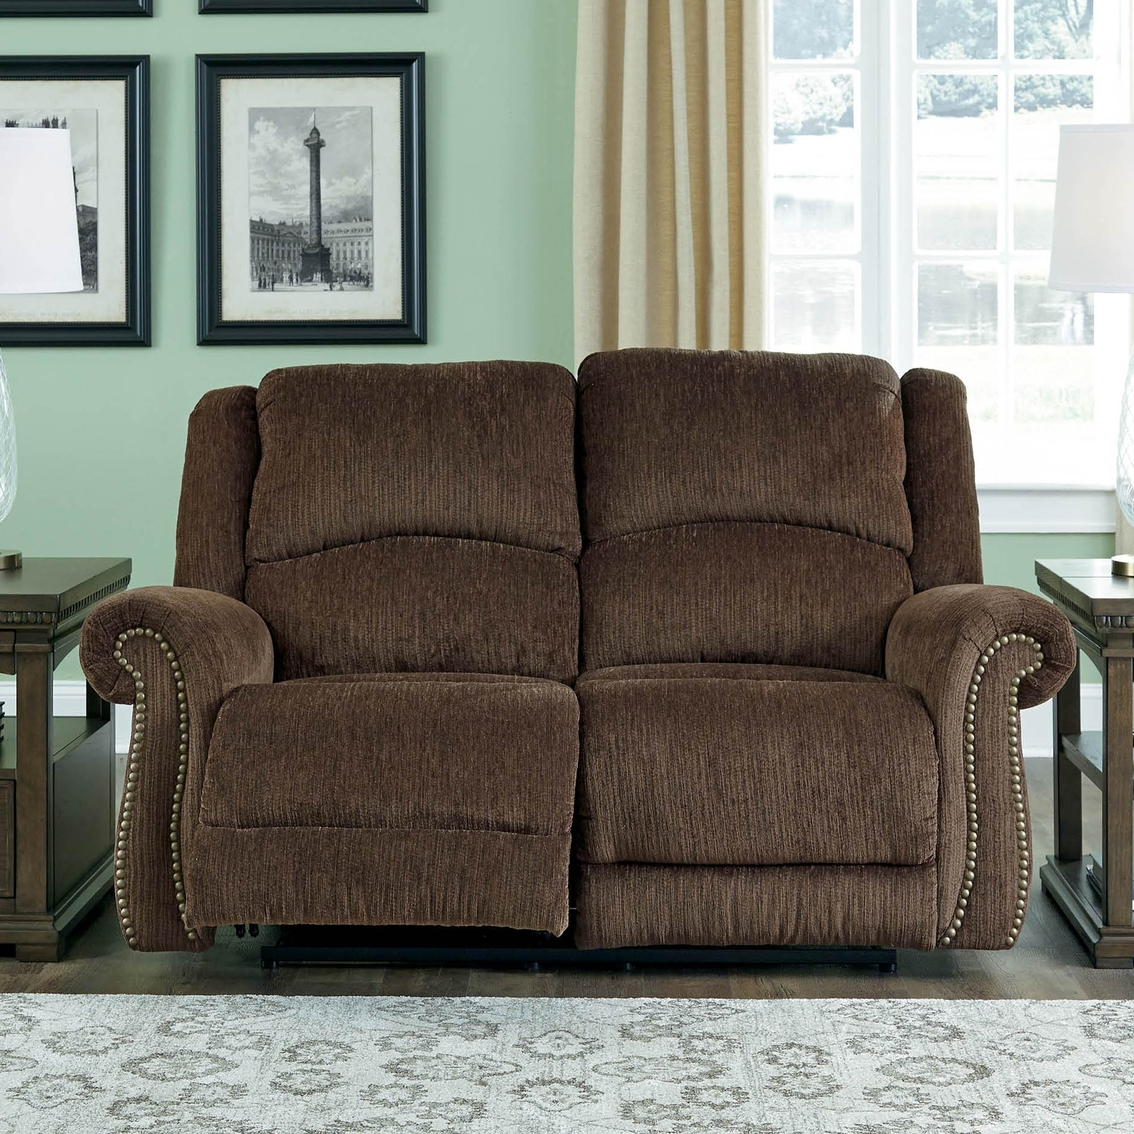 Strange Ashley Goodlow Power Reclining Loveseat With Power Headrest Alphanode Cool Chair Designs And Ideas Alphanodeonline